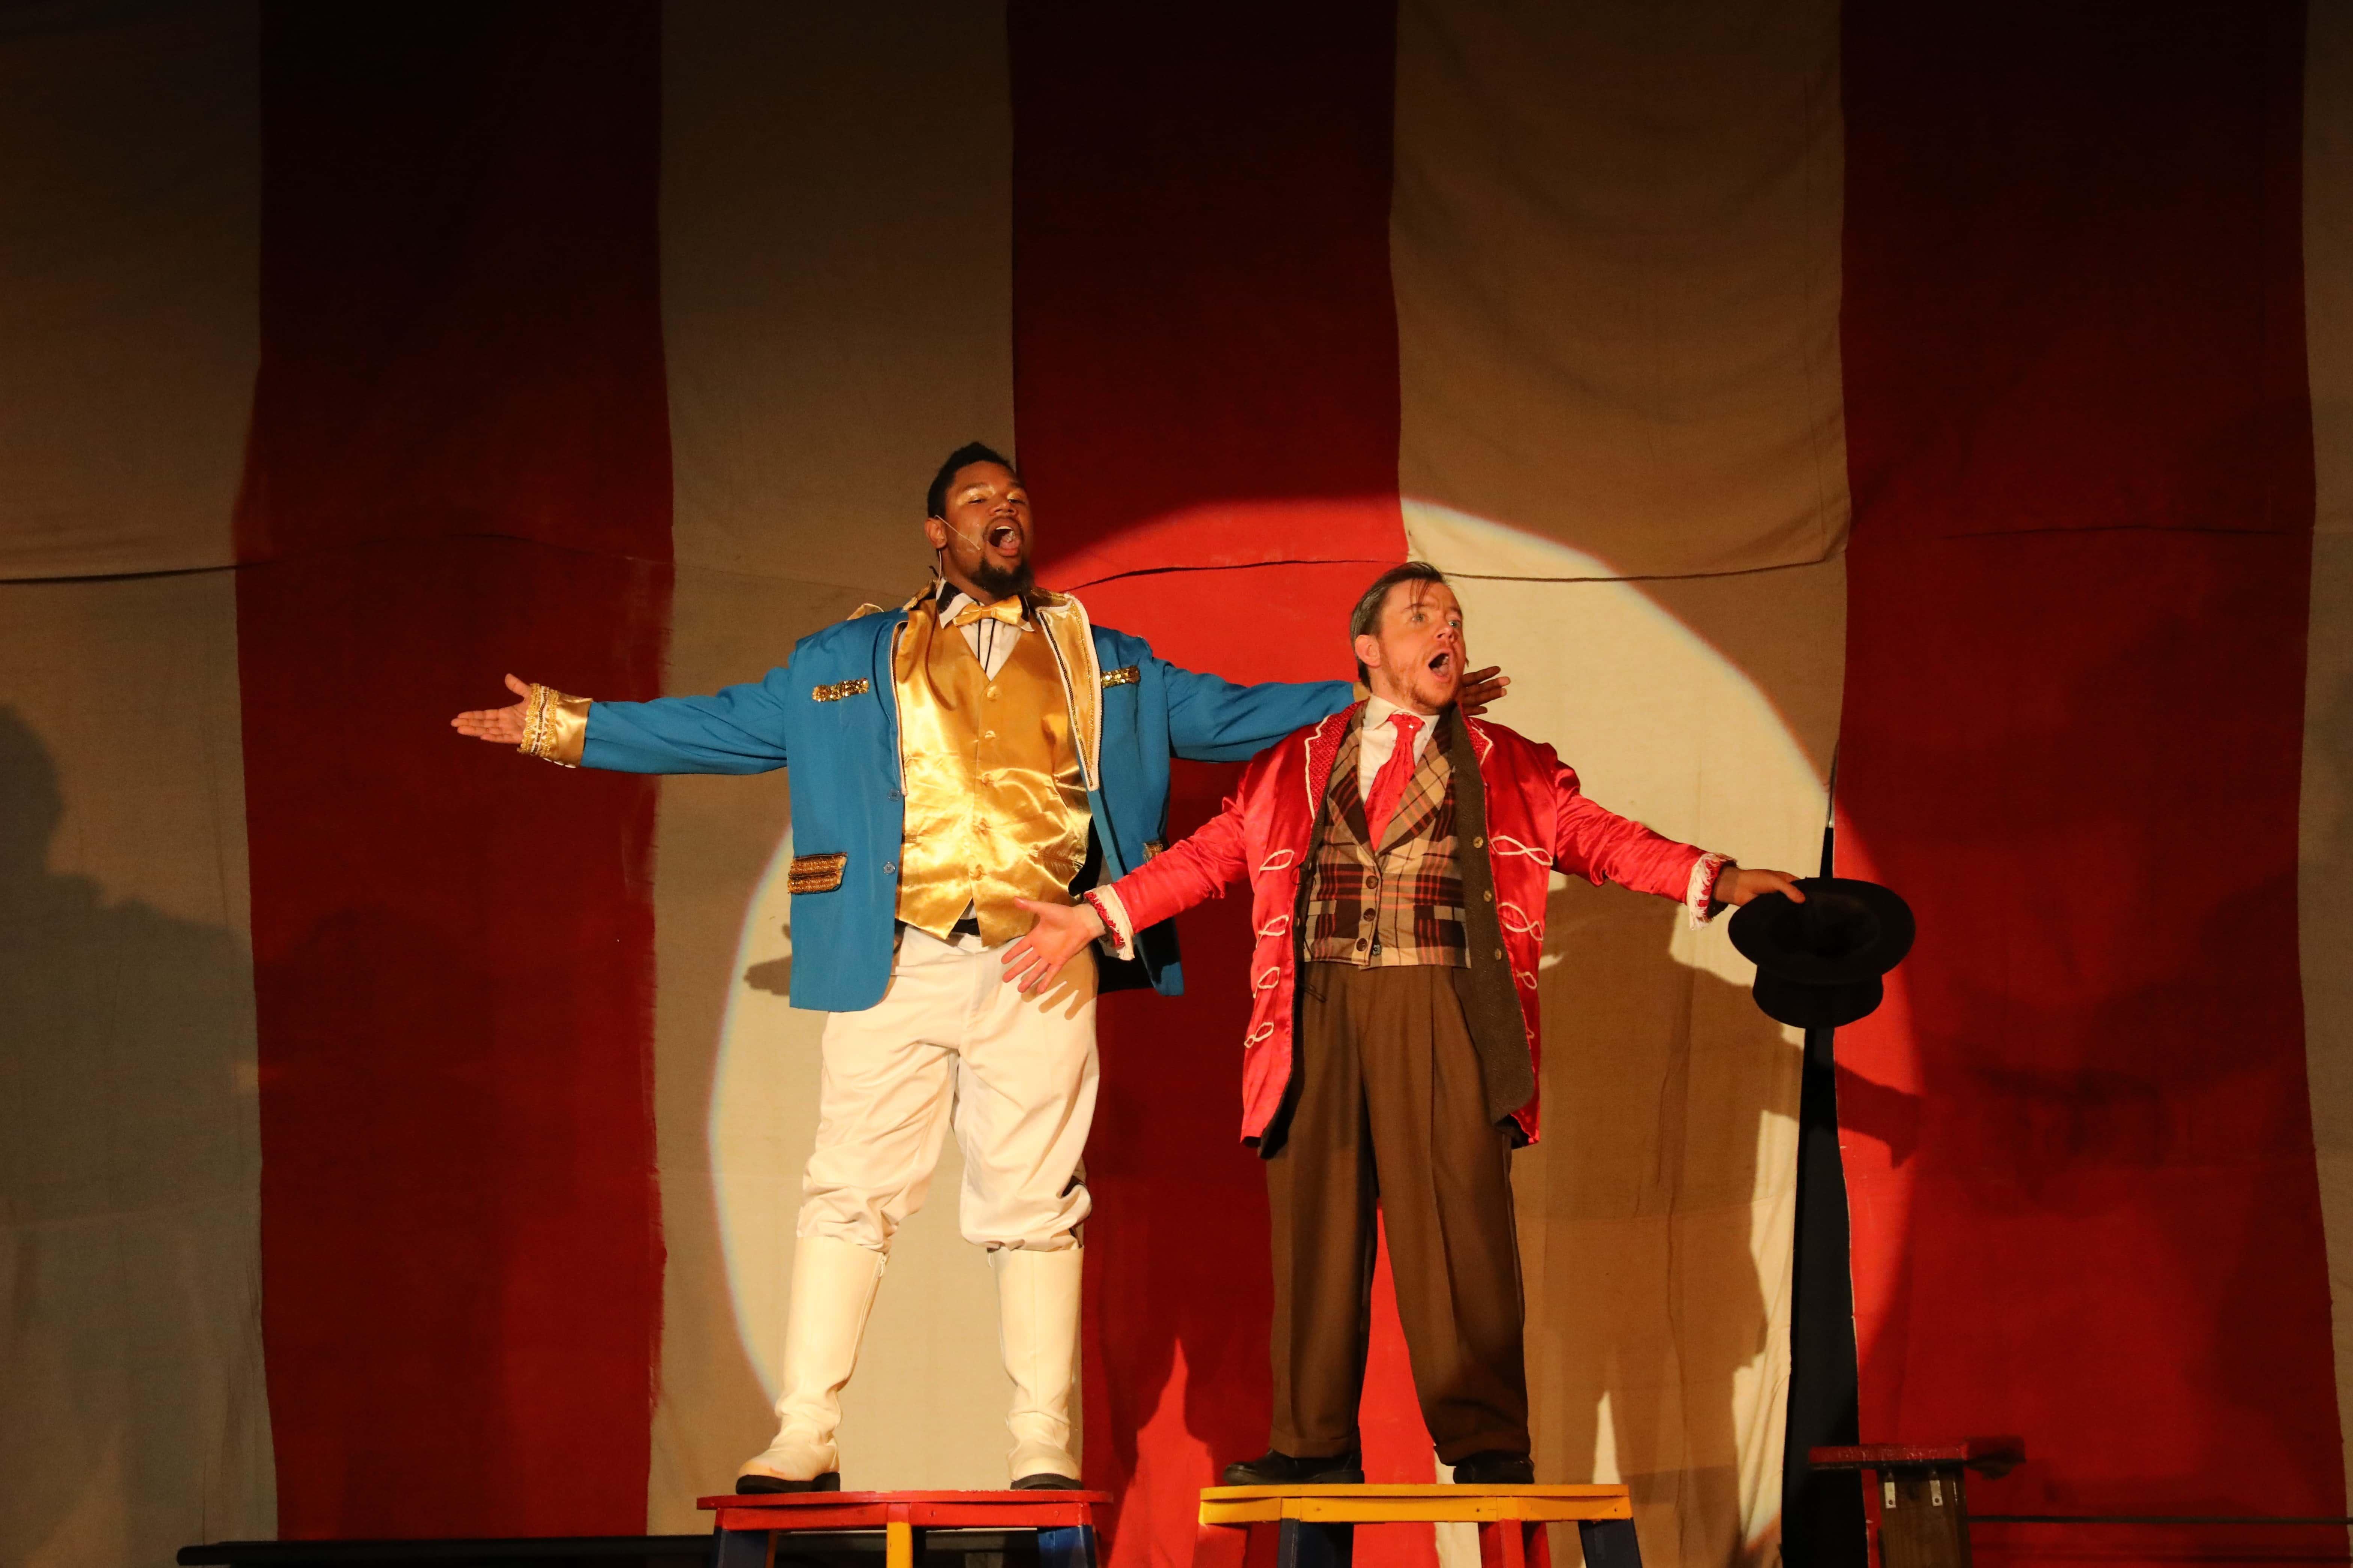 James Doggett (left) as Bailey and Matt Wetzel (right) as Barnum. Photo by Shealyn Jae Photography